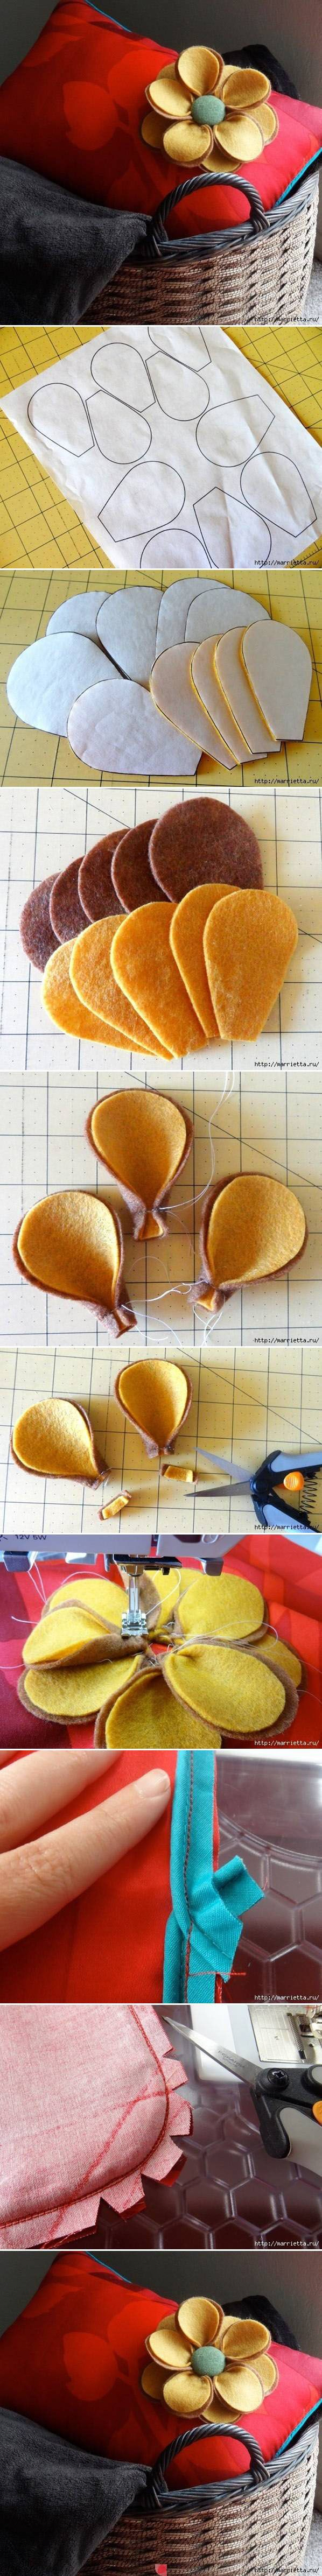 feltflower tutorial